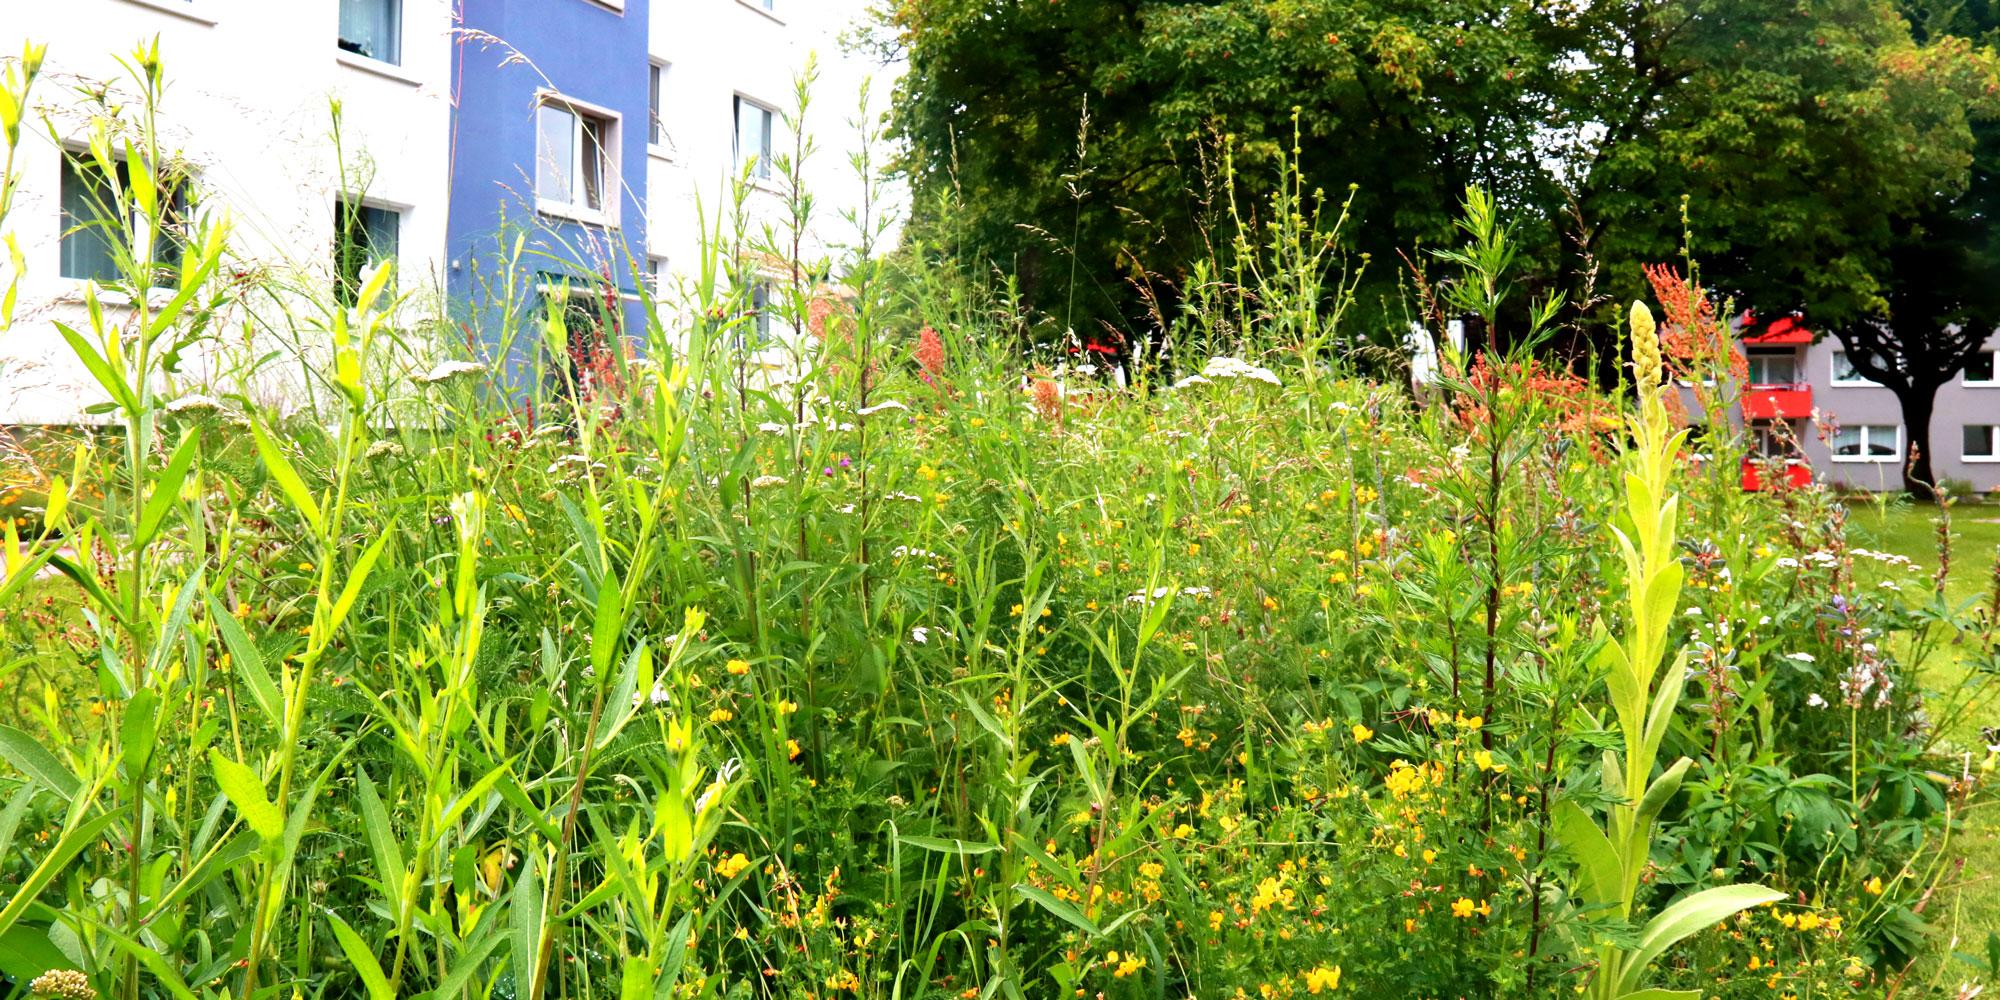 Wildblumenwiese in Bielefeld